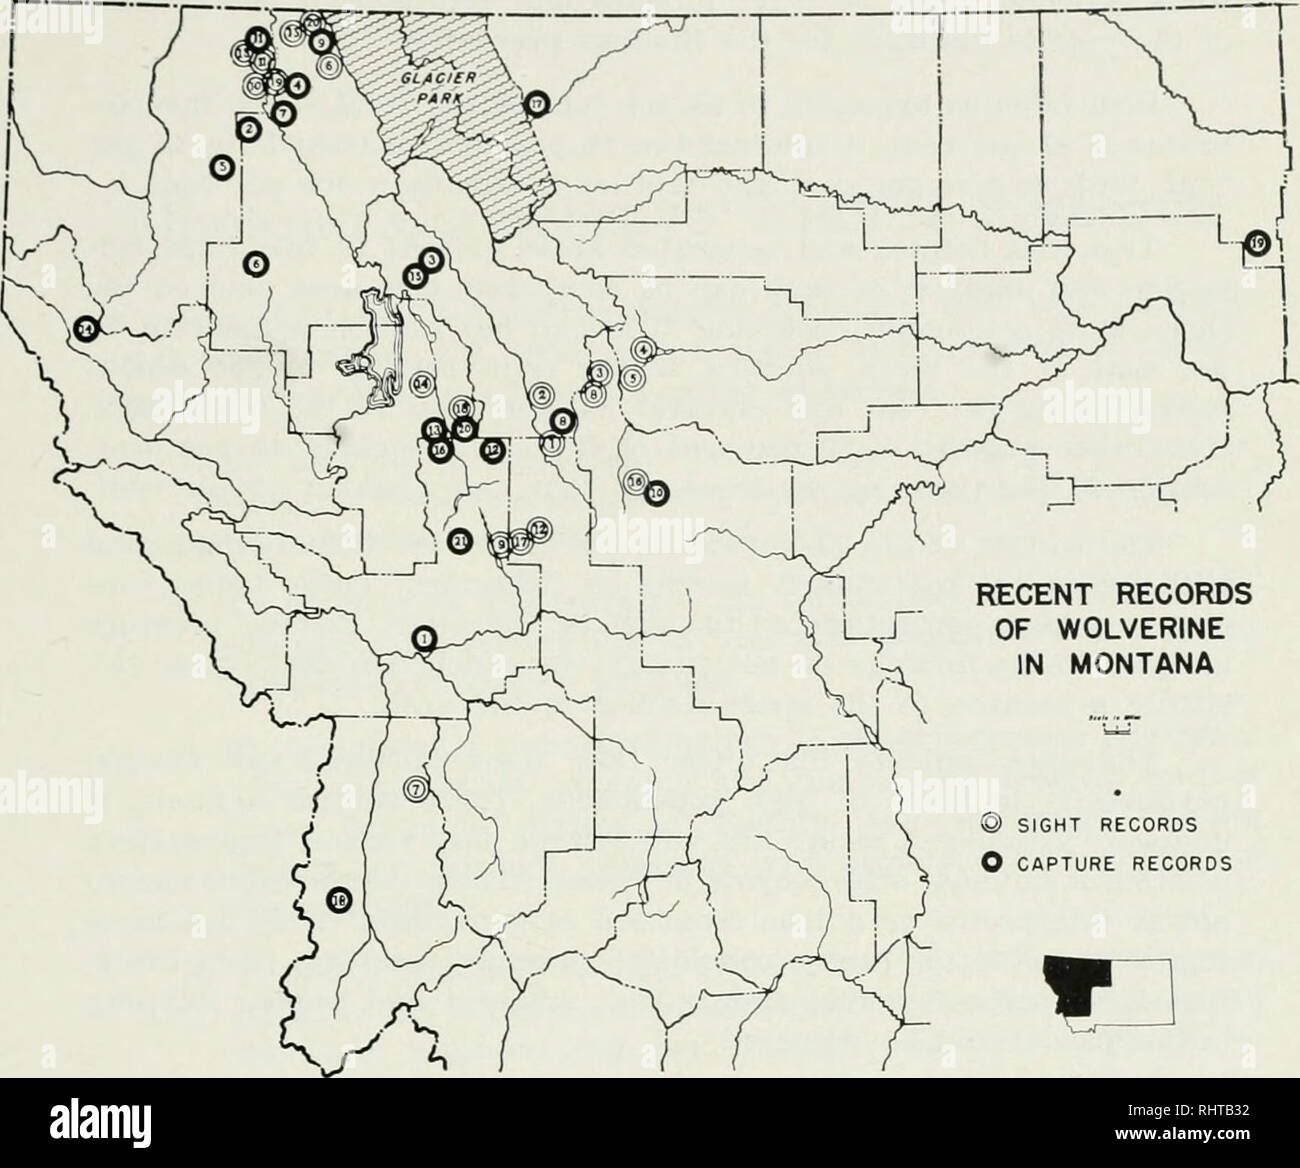 Map Of Montana State Stock Photos & Map Of Montana State Stock ...